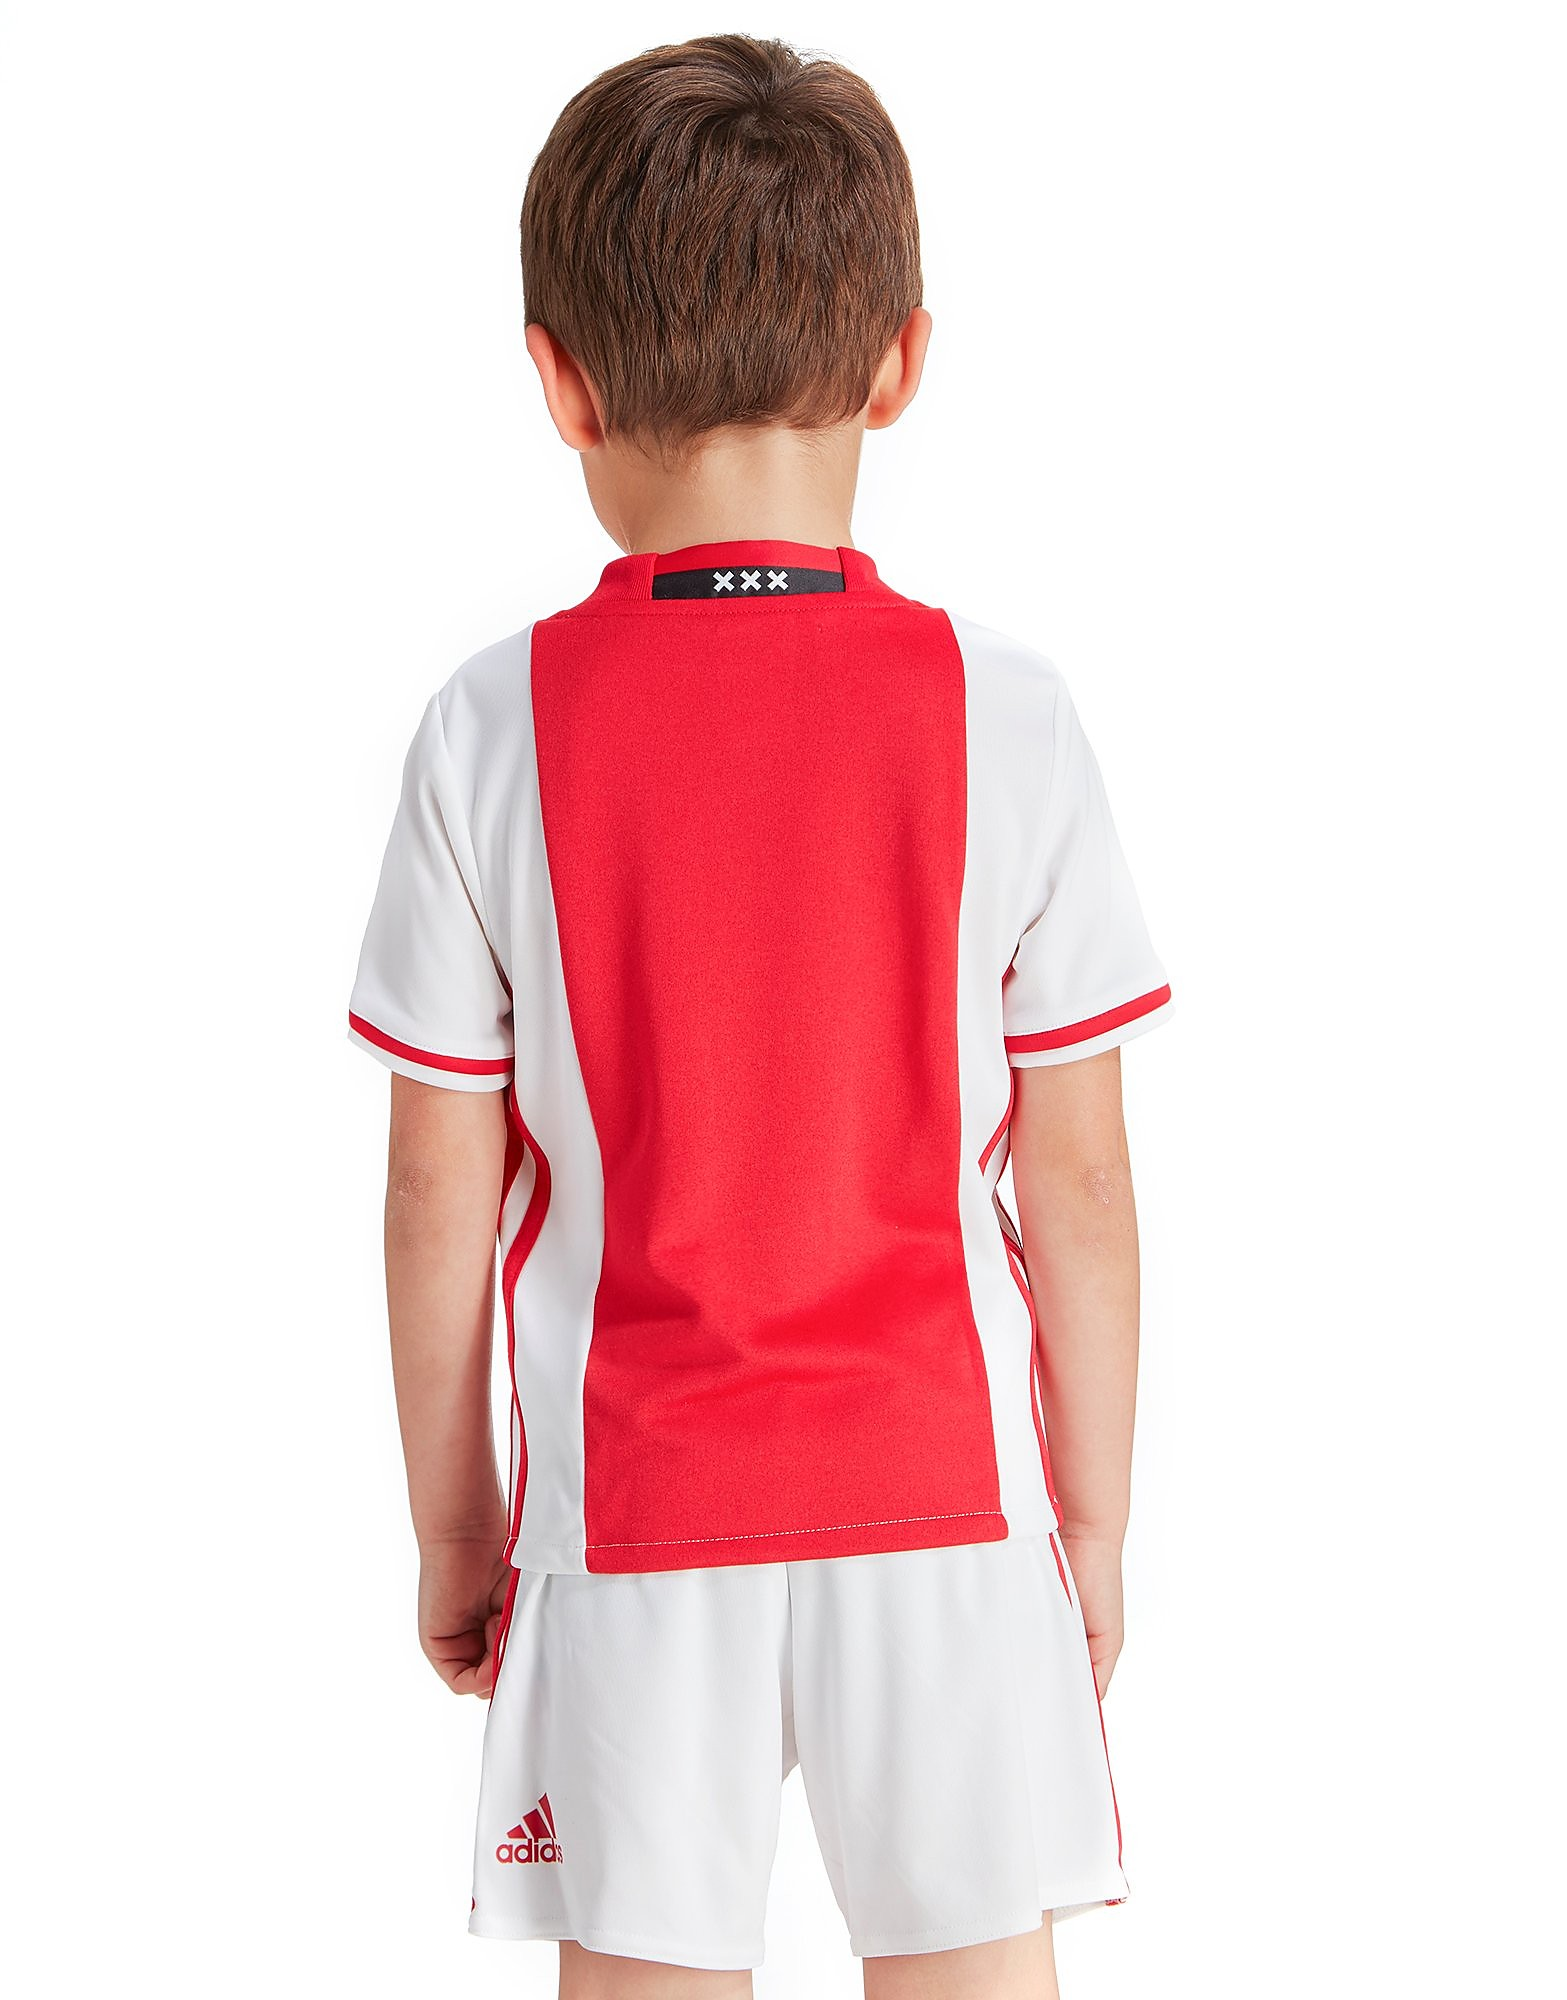 adidas Ajax 2016/17 Heimspiel-Kit Kinder